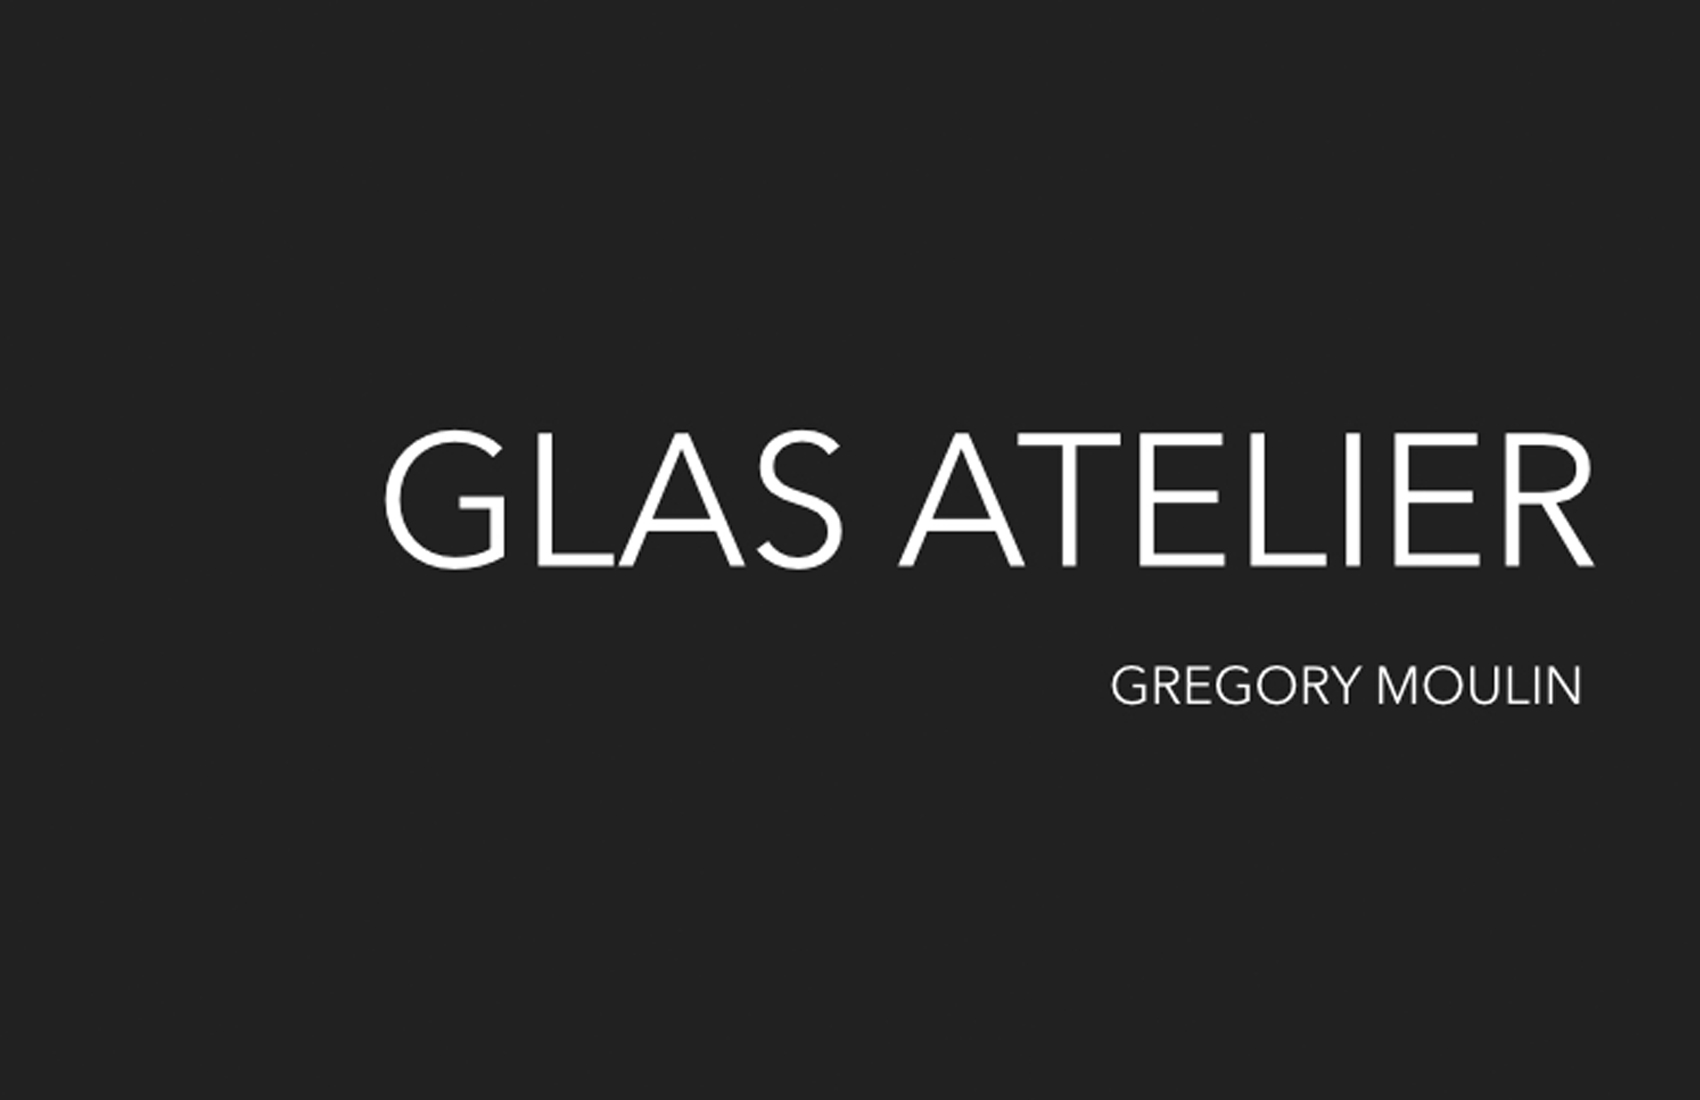 Glas Atelier Grégory Moulin